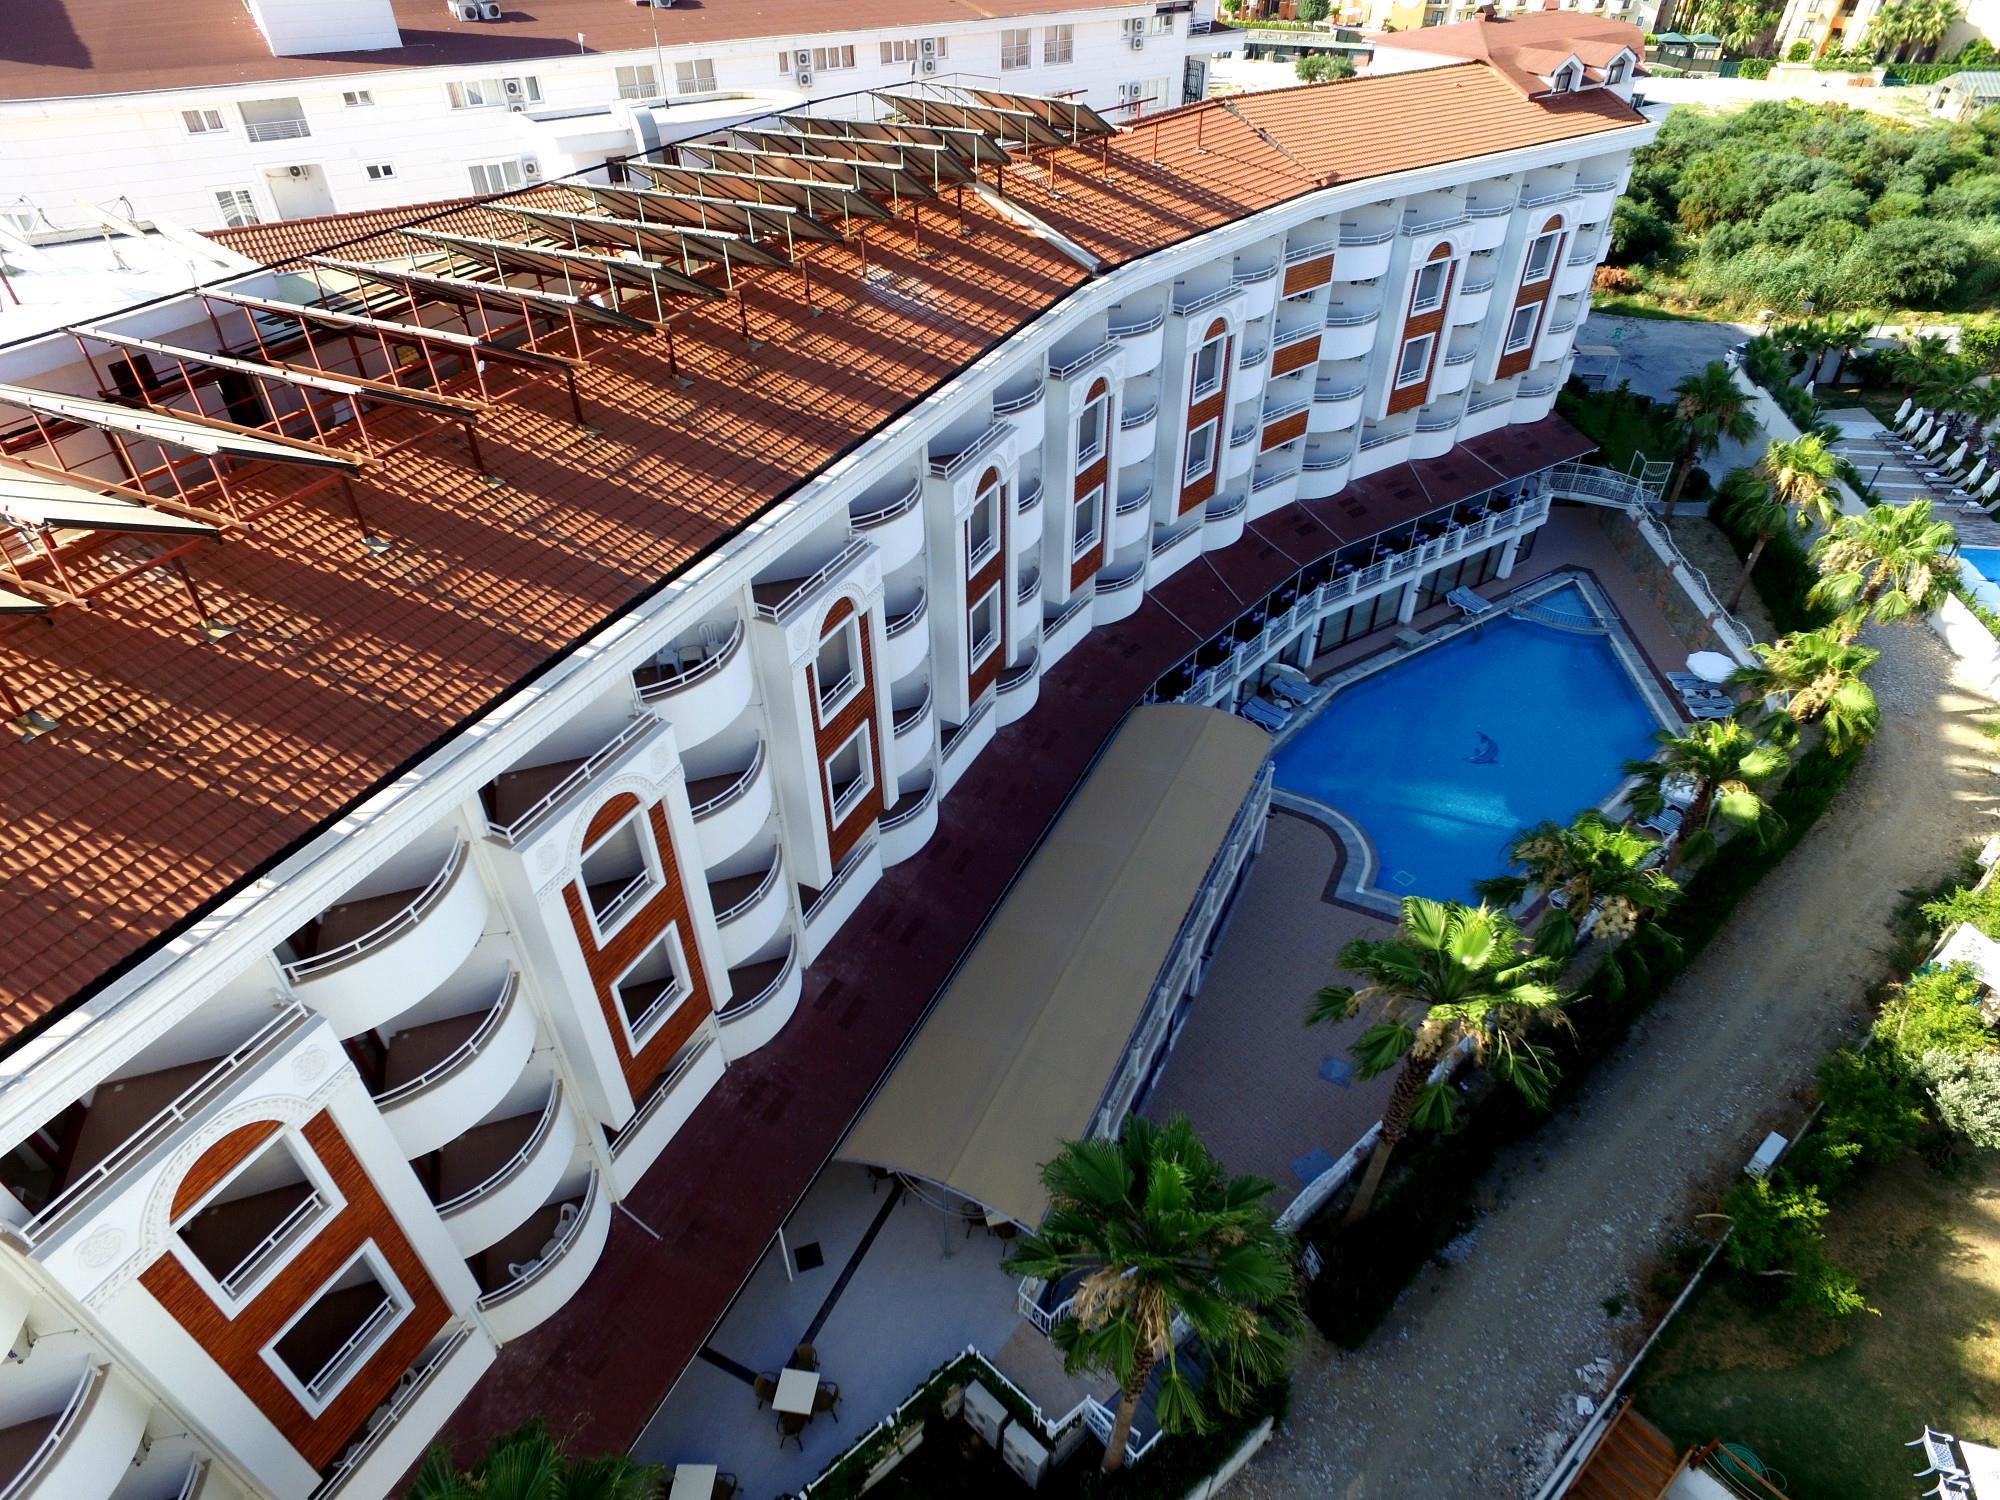 http://www.orextravel.sk/OREX/hotelphotos/side-royal-paradise-general-0023.jpg